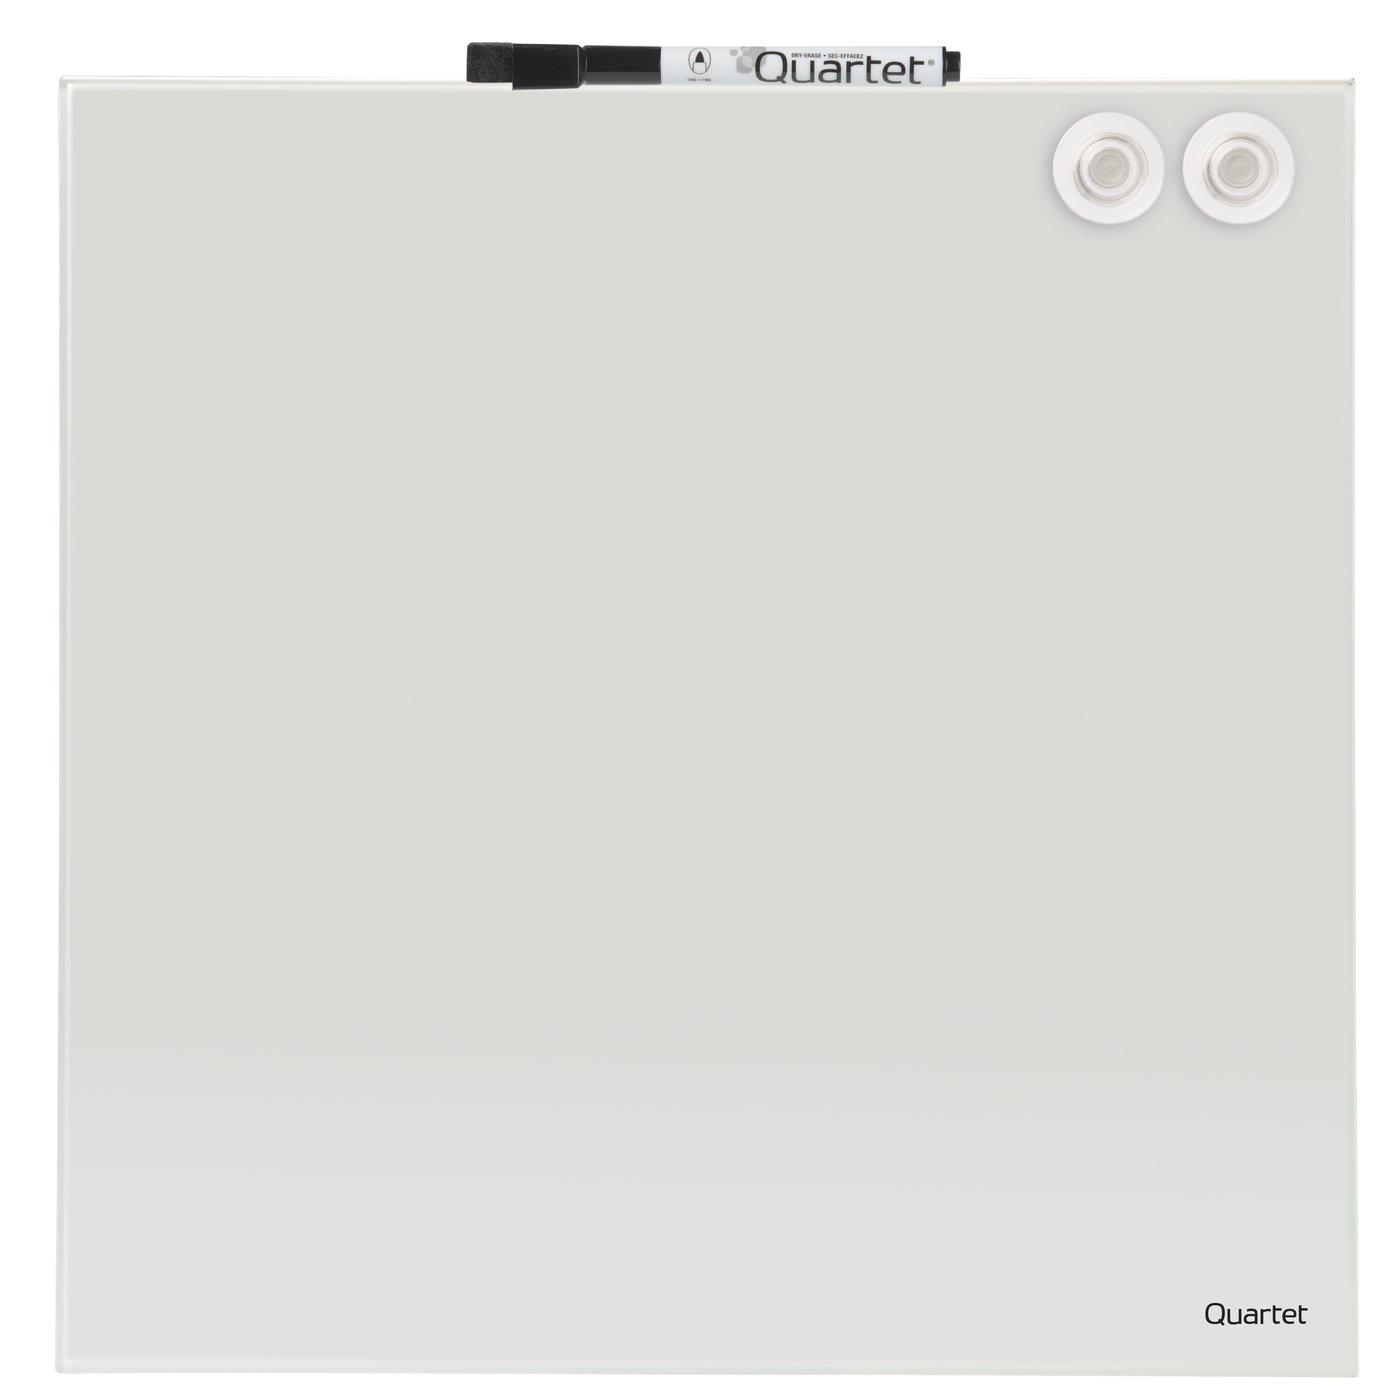 e4ddd9f4c7b Quartet - Boards - Whiteboards - Glass Dry-Erase Boards - Quartet® Magnetic  Glass Dry-Erase Board